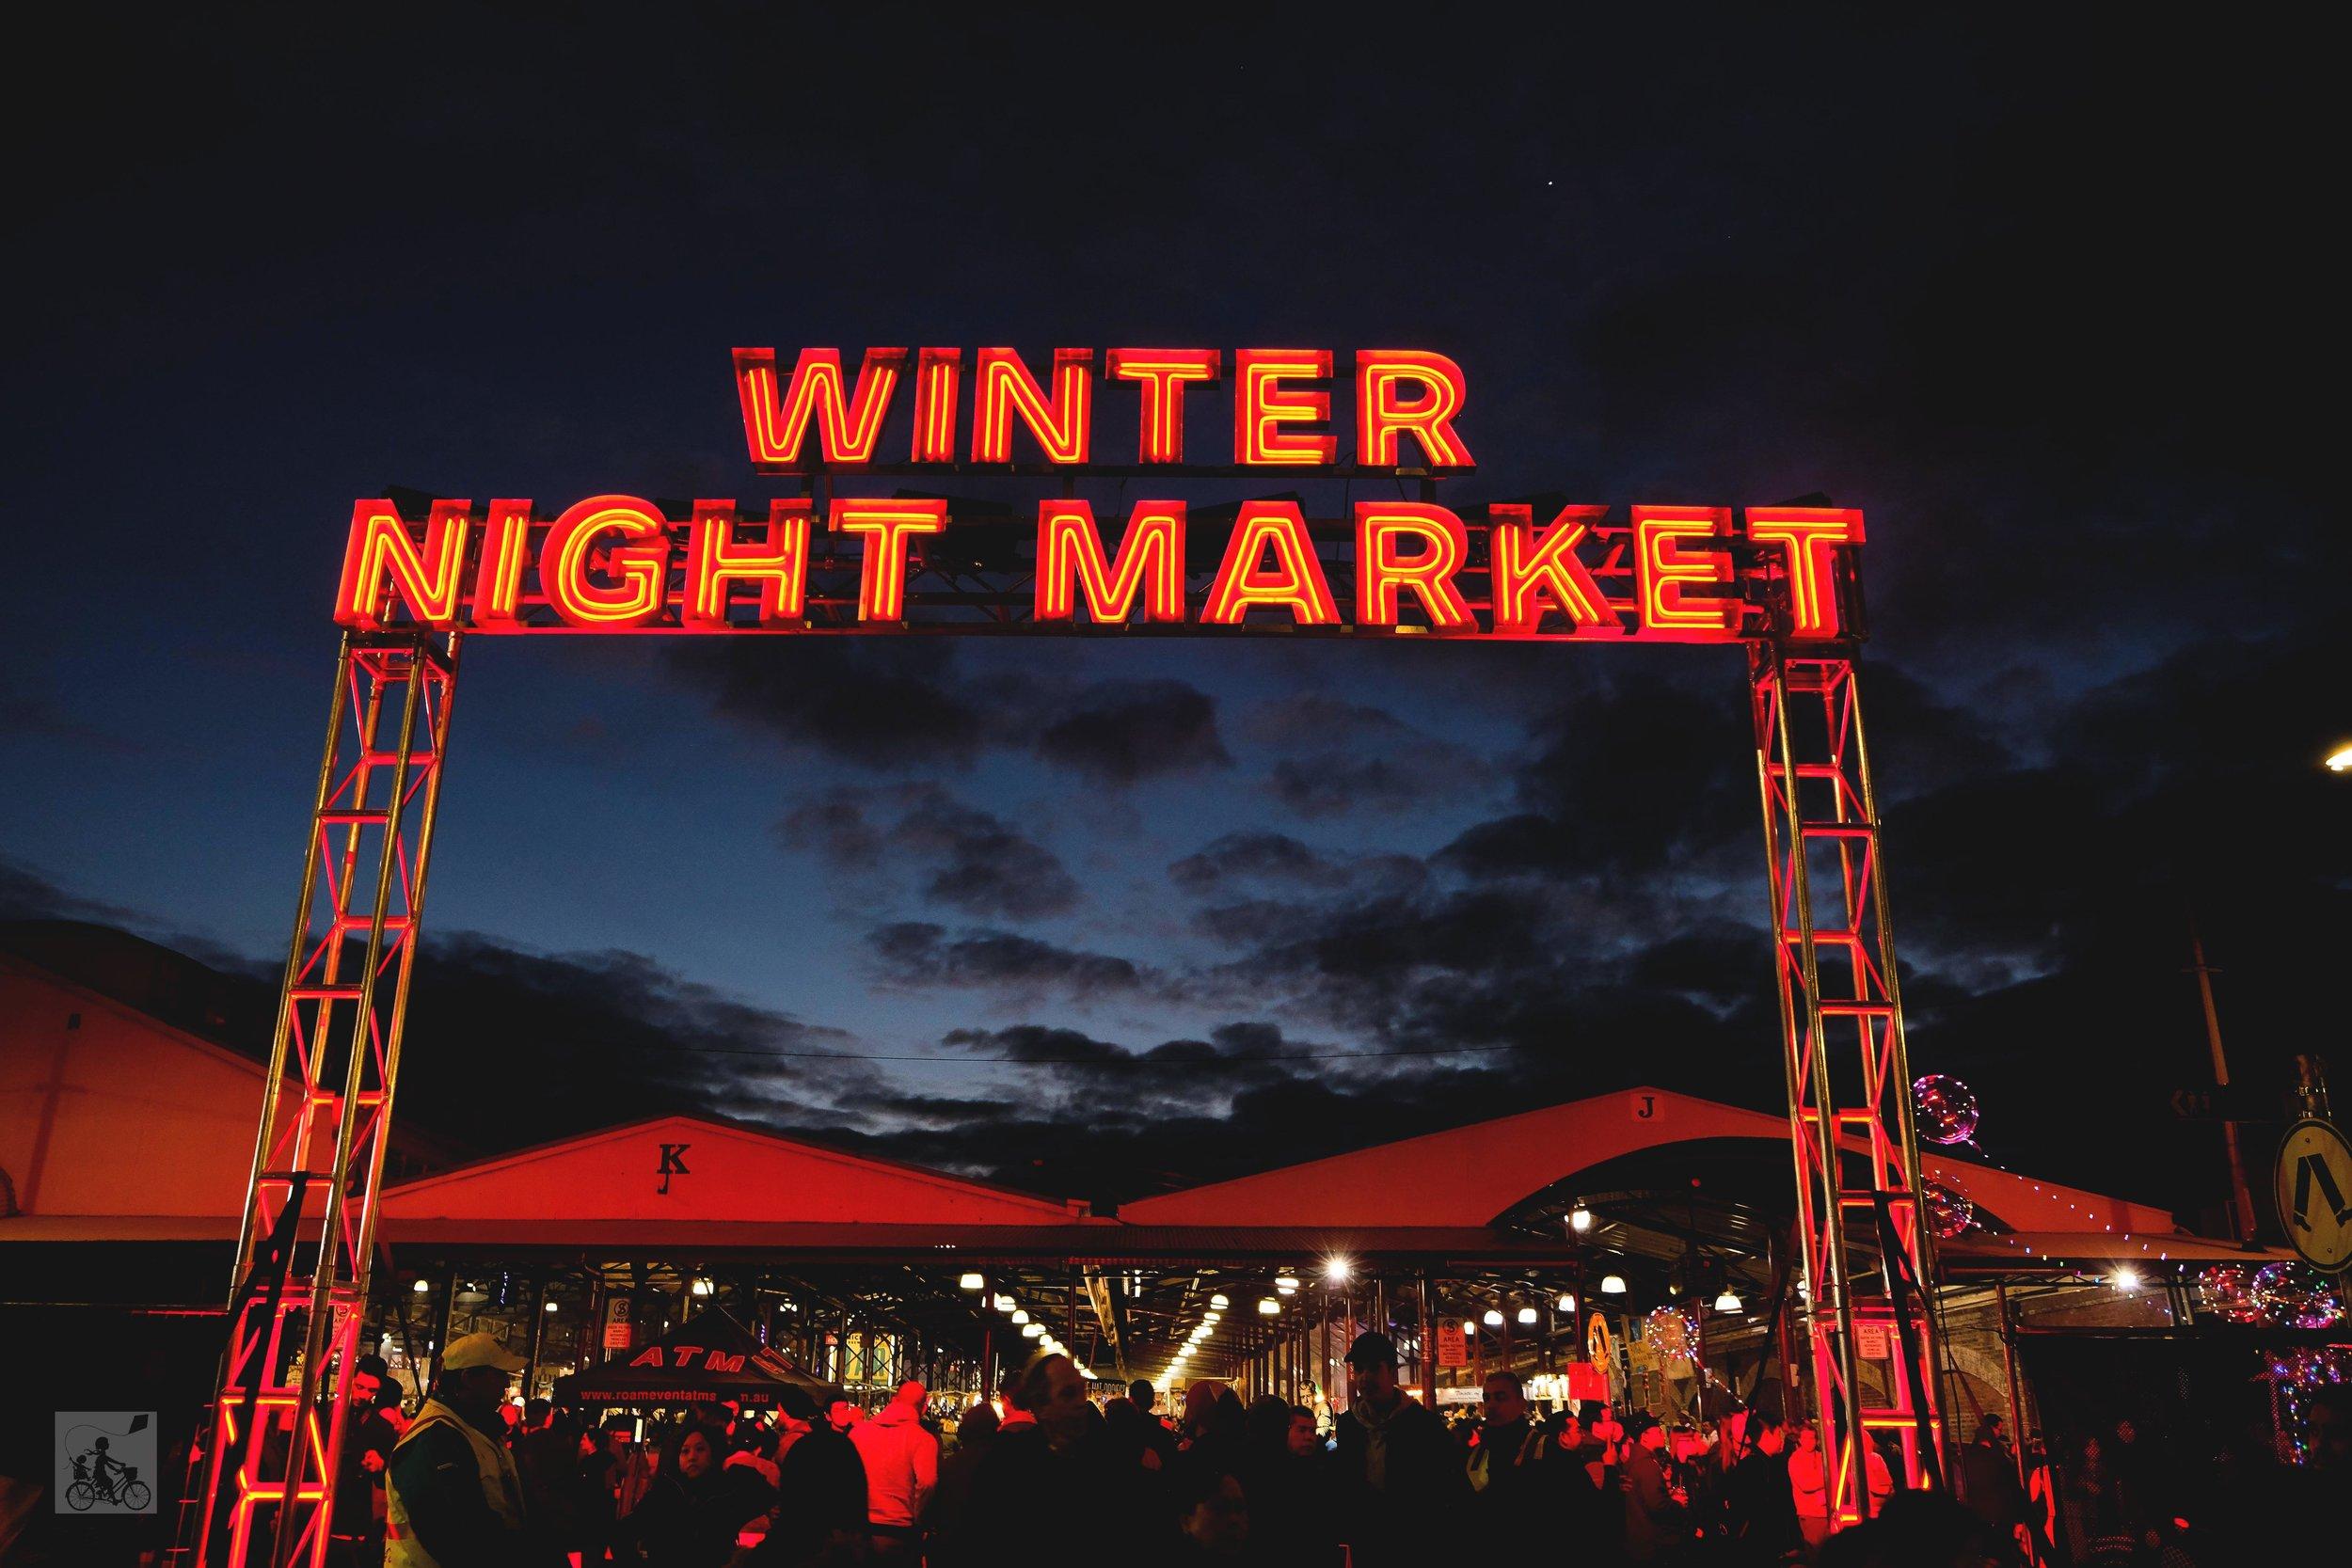 winter night market, qv market - mamma knows north